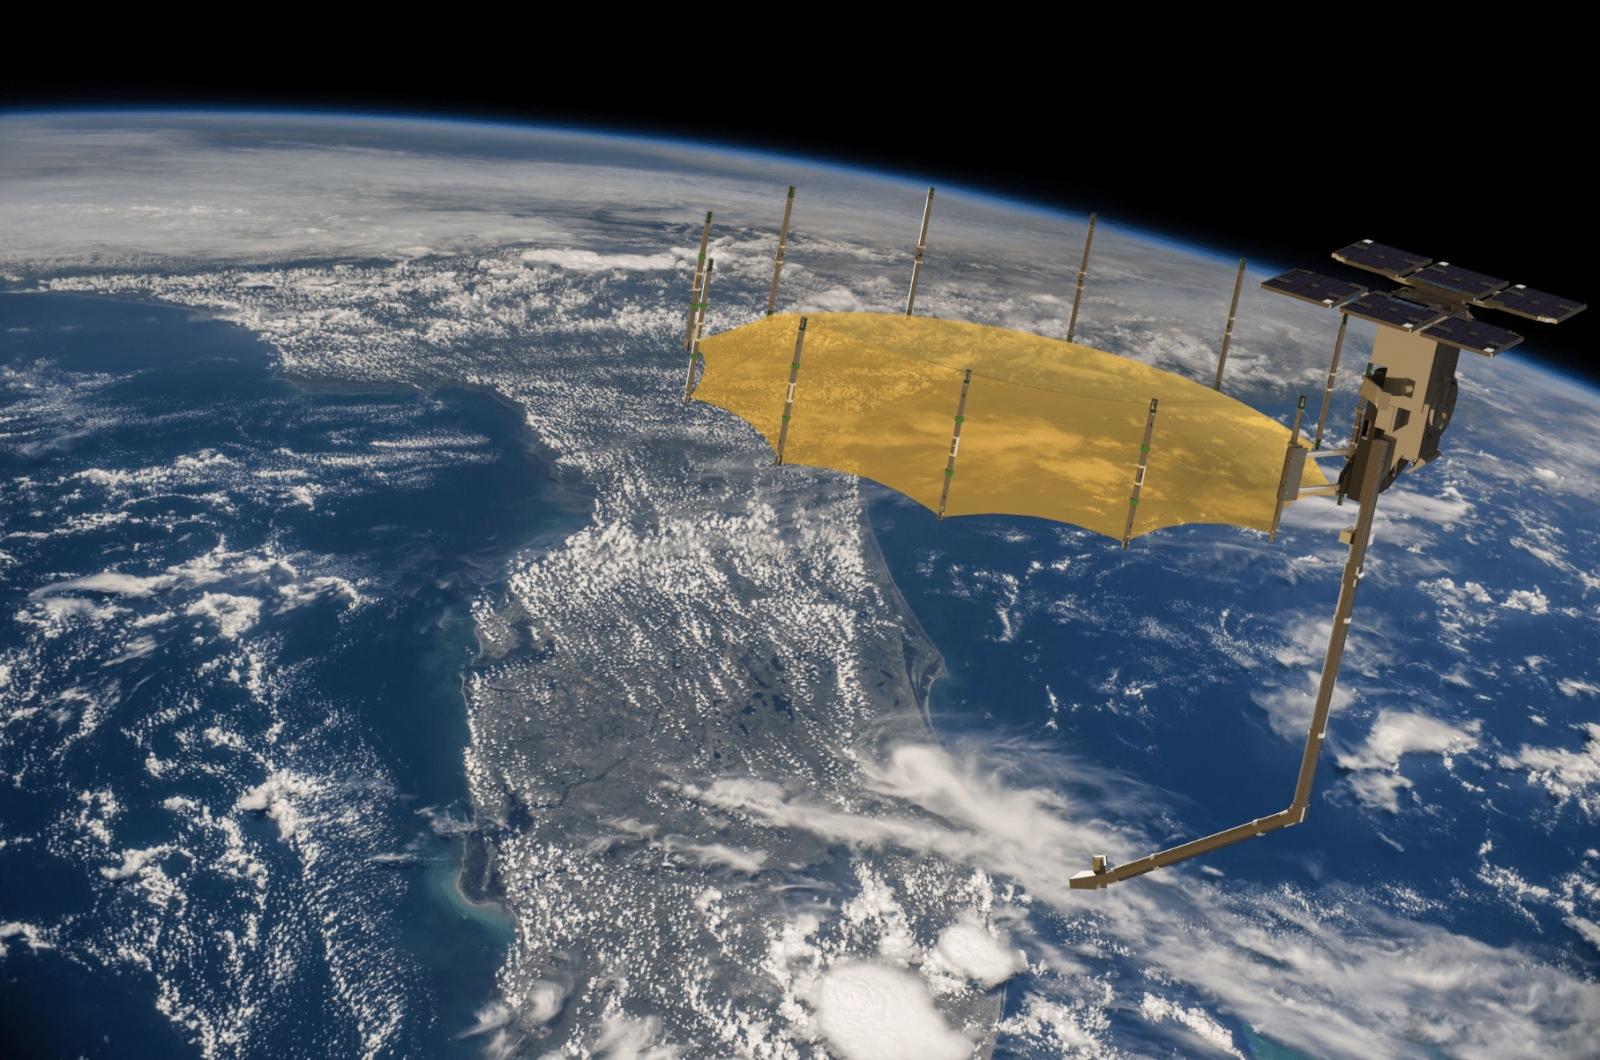 Rocket Lab's Electron rocket makes a successful return to flight